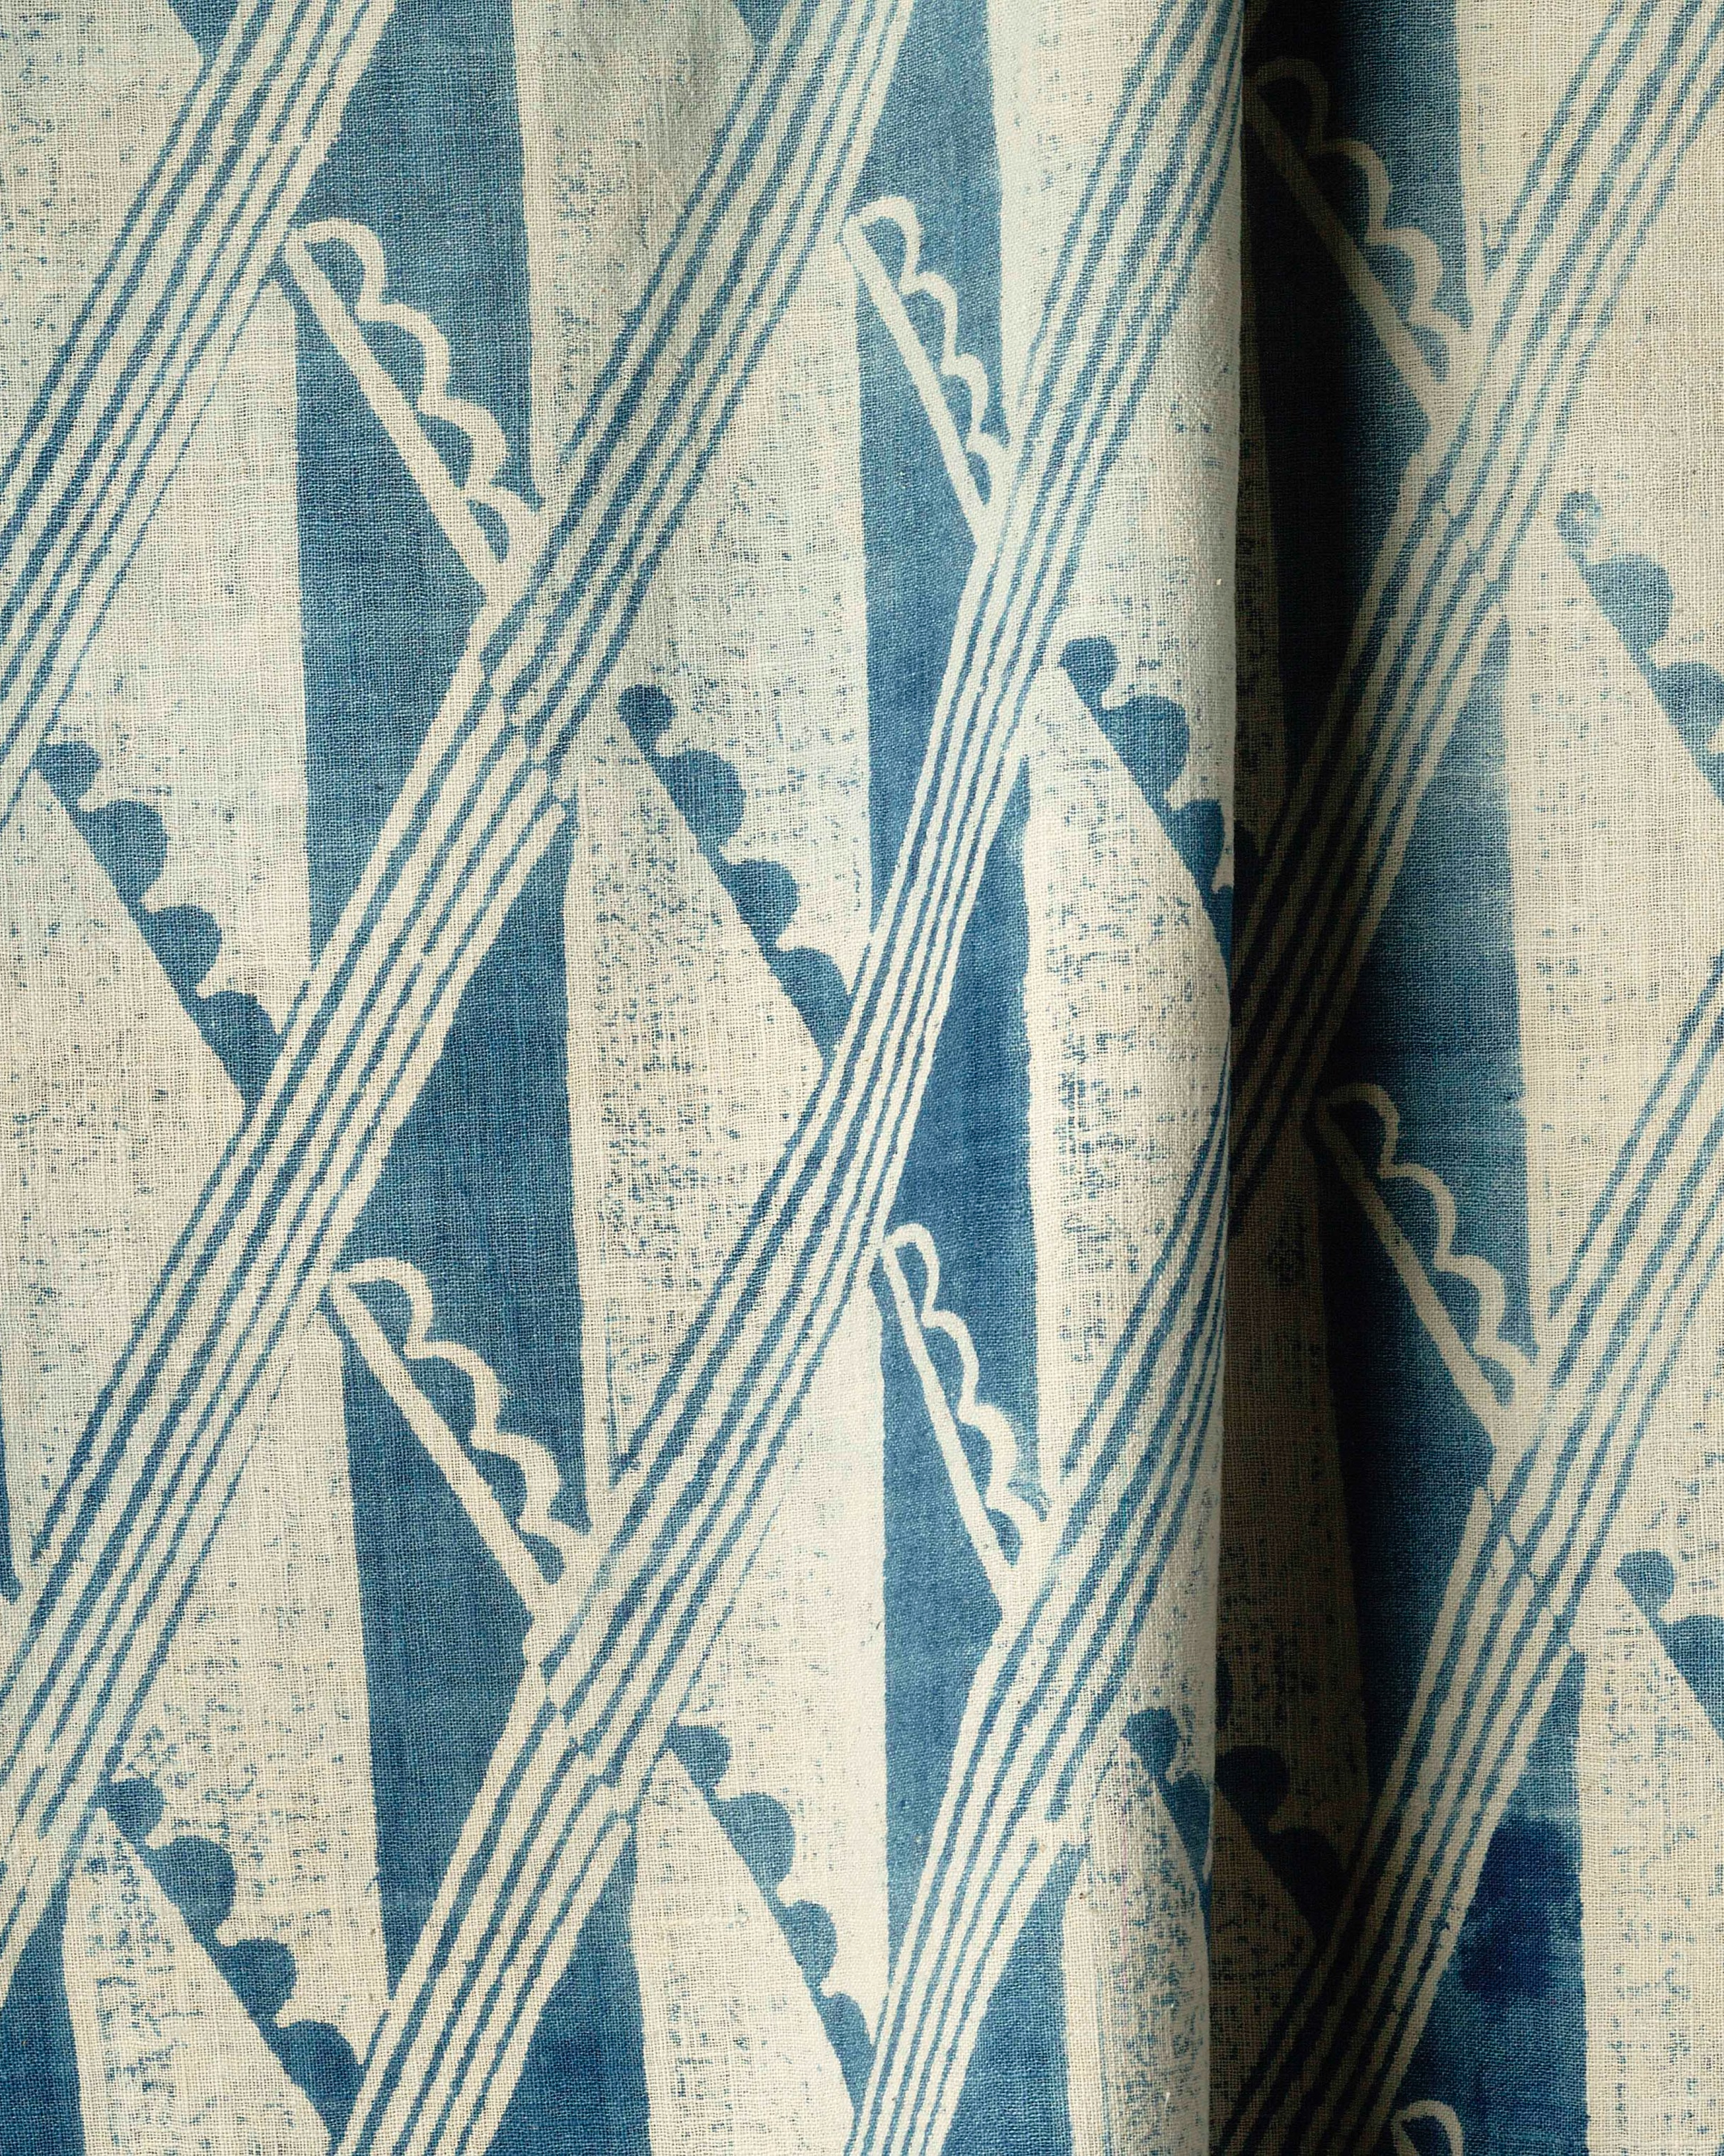 Barron and larcher, ' diagonal '  block print